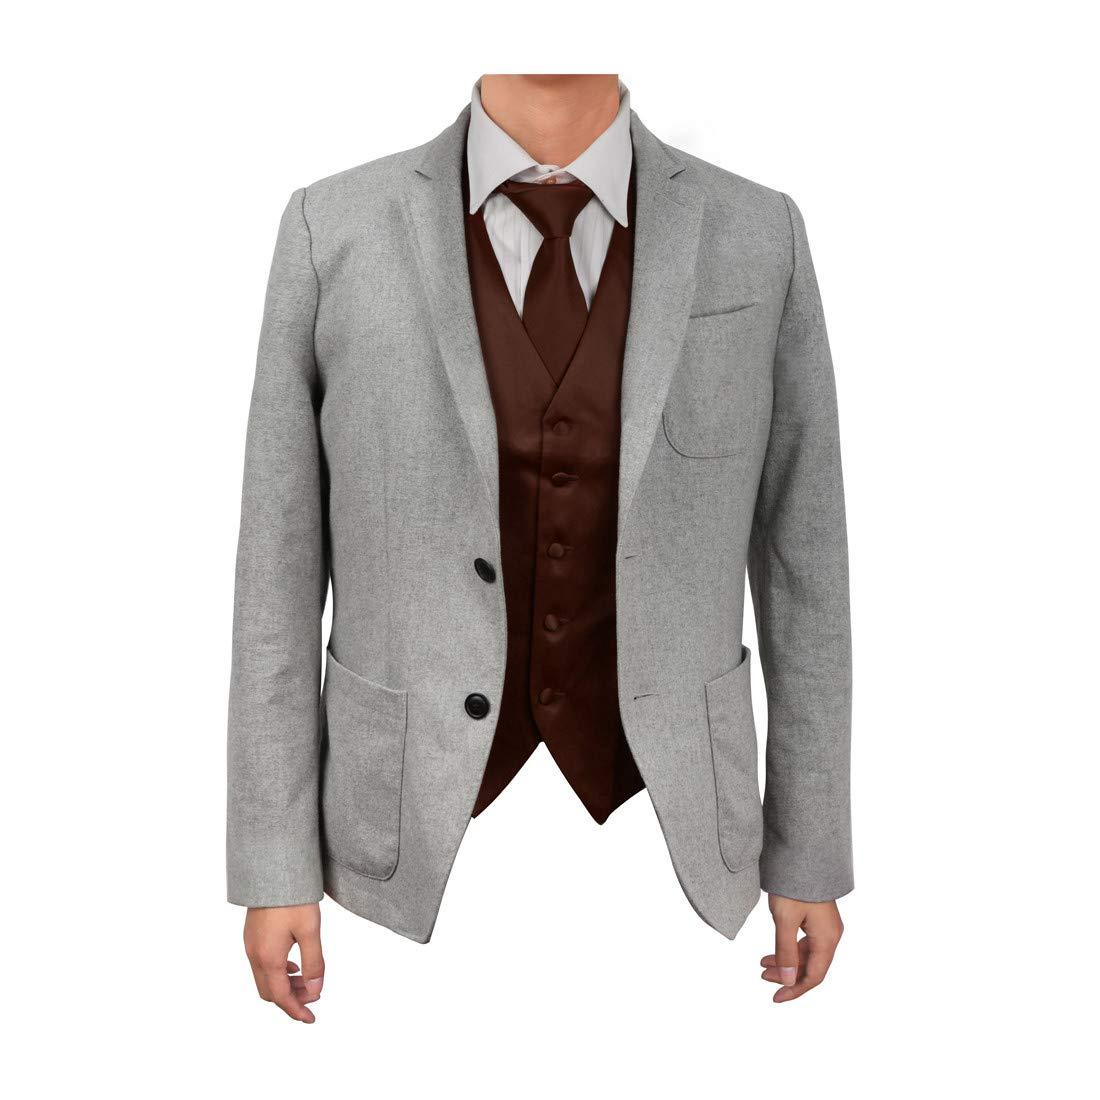 DGDE0002-M Dark Violet Gentlemen Plain Microfiber Satin For Designer Vest Matching Neck Tie By Dan Smith